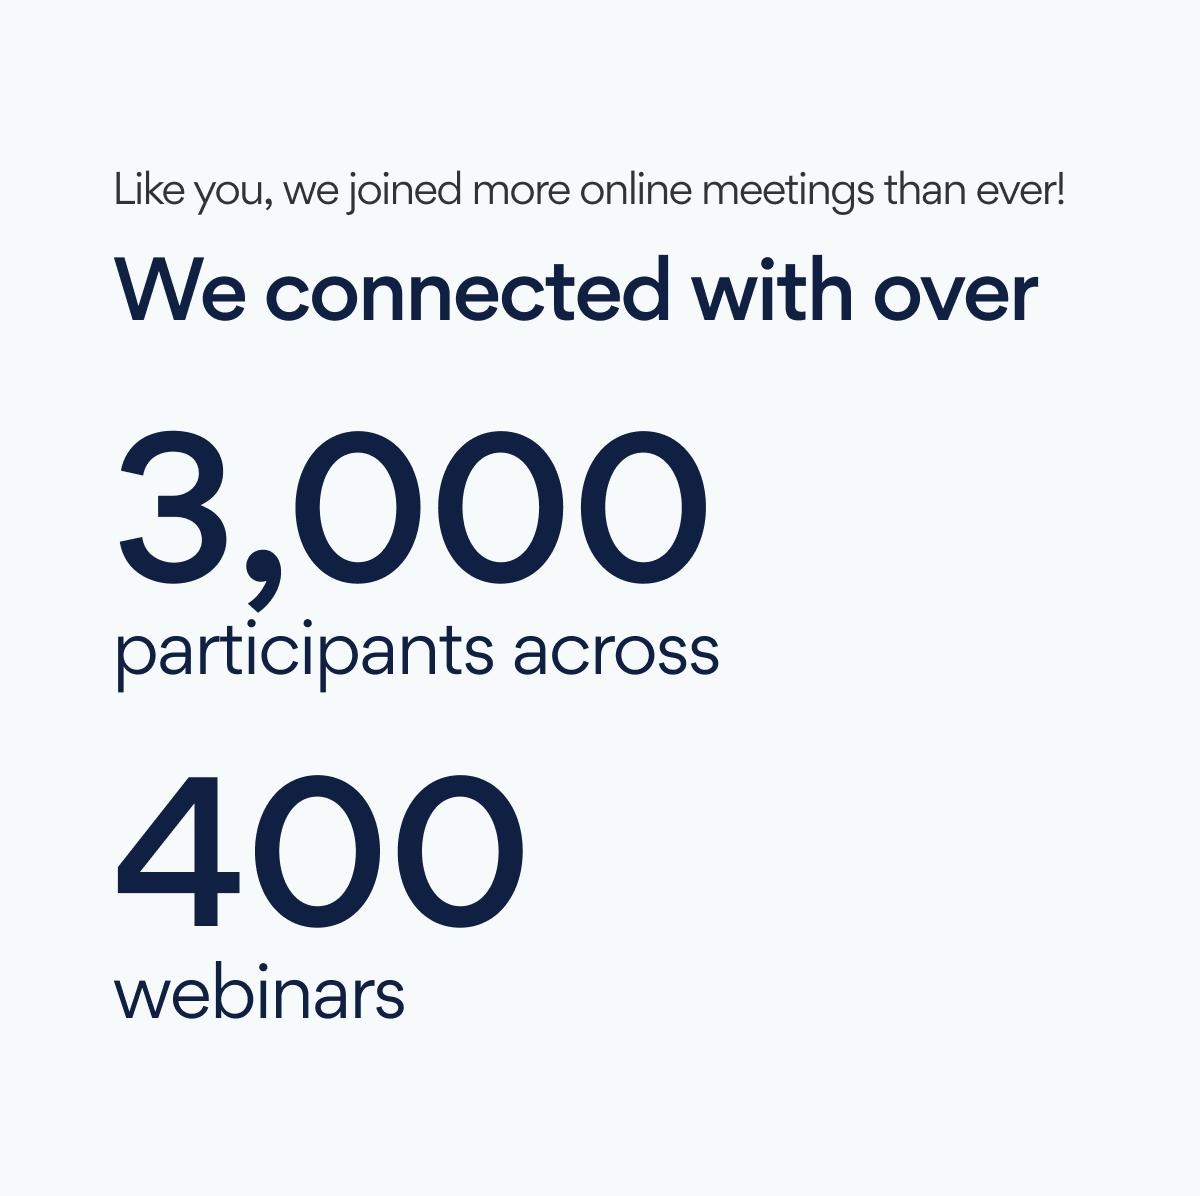 2020 webinars